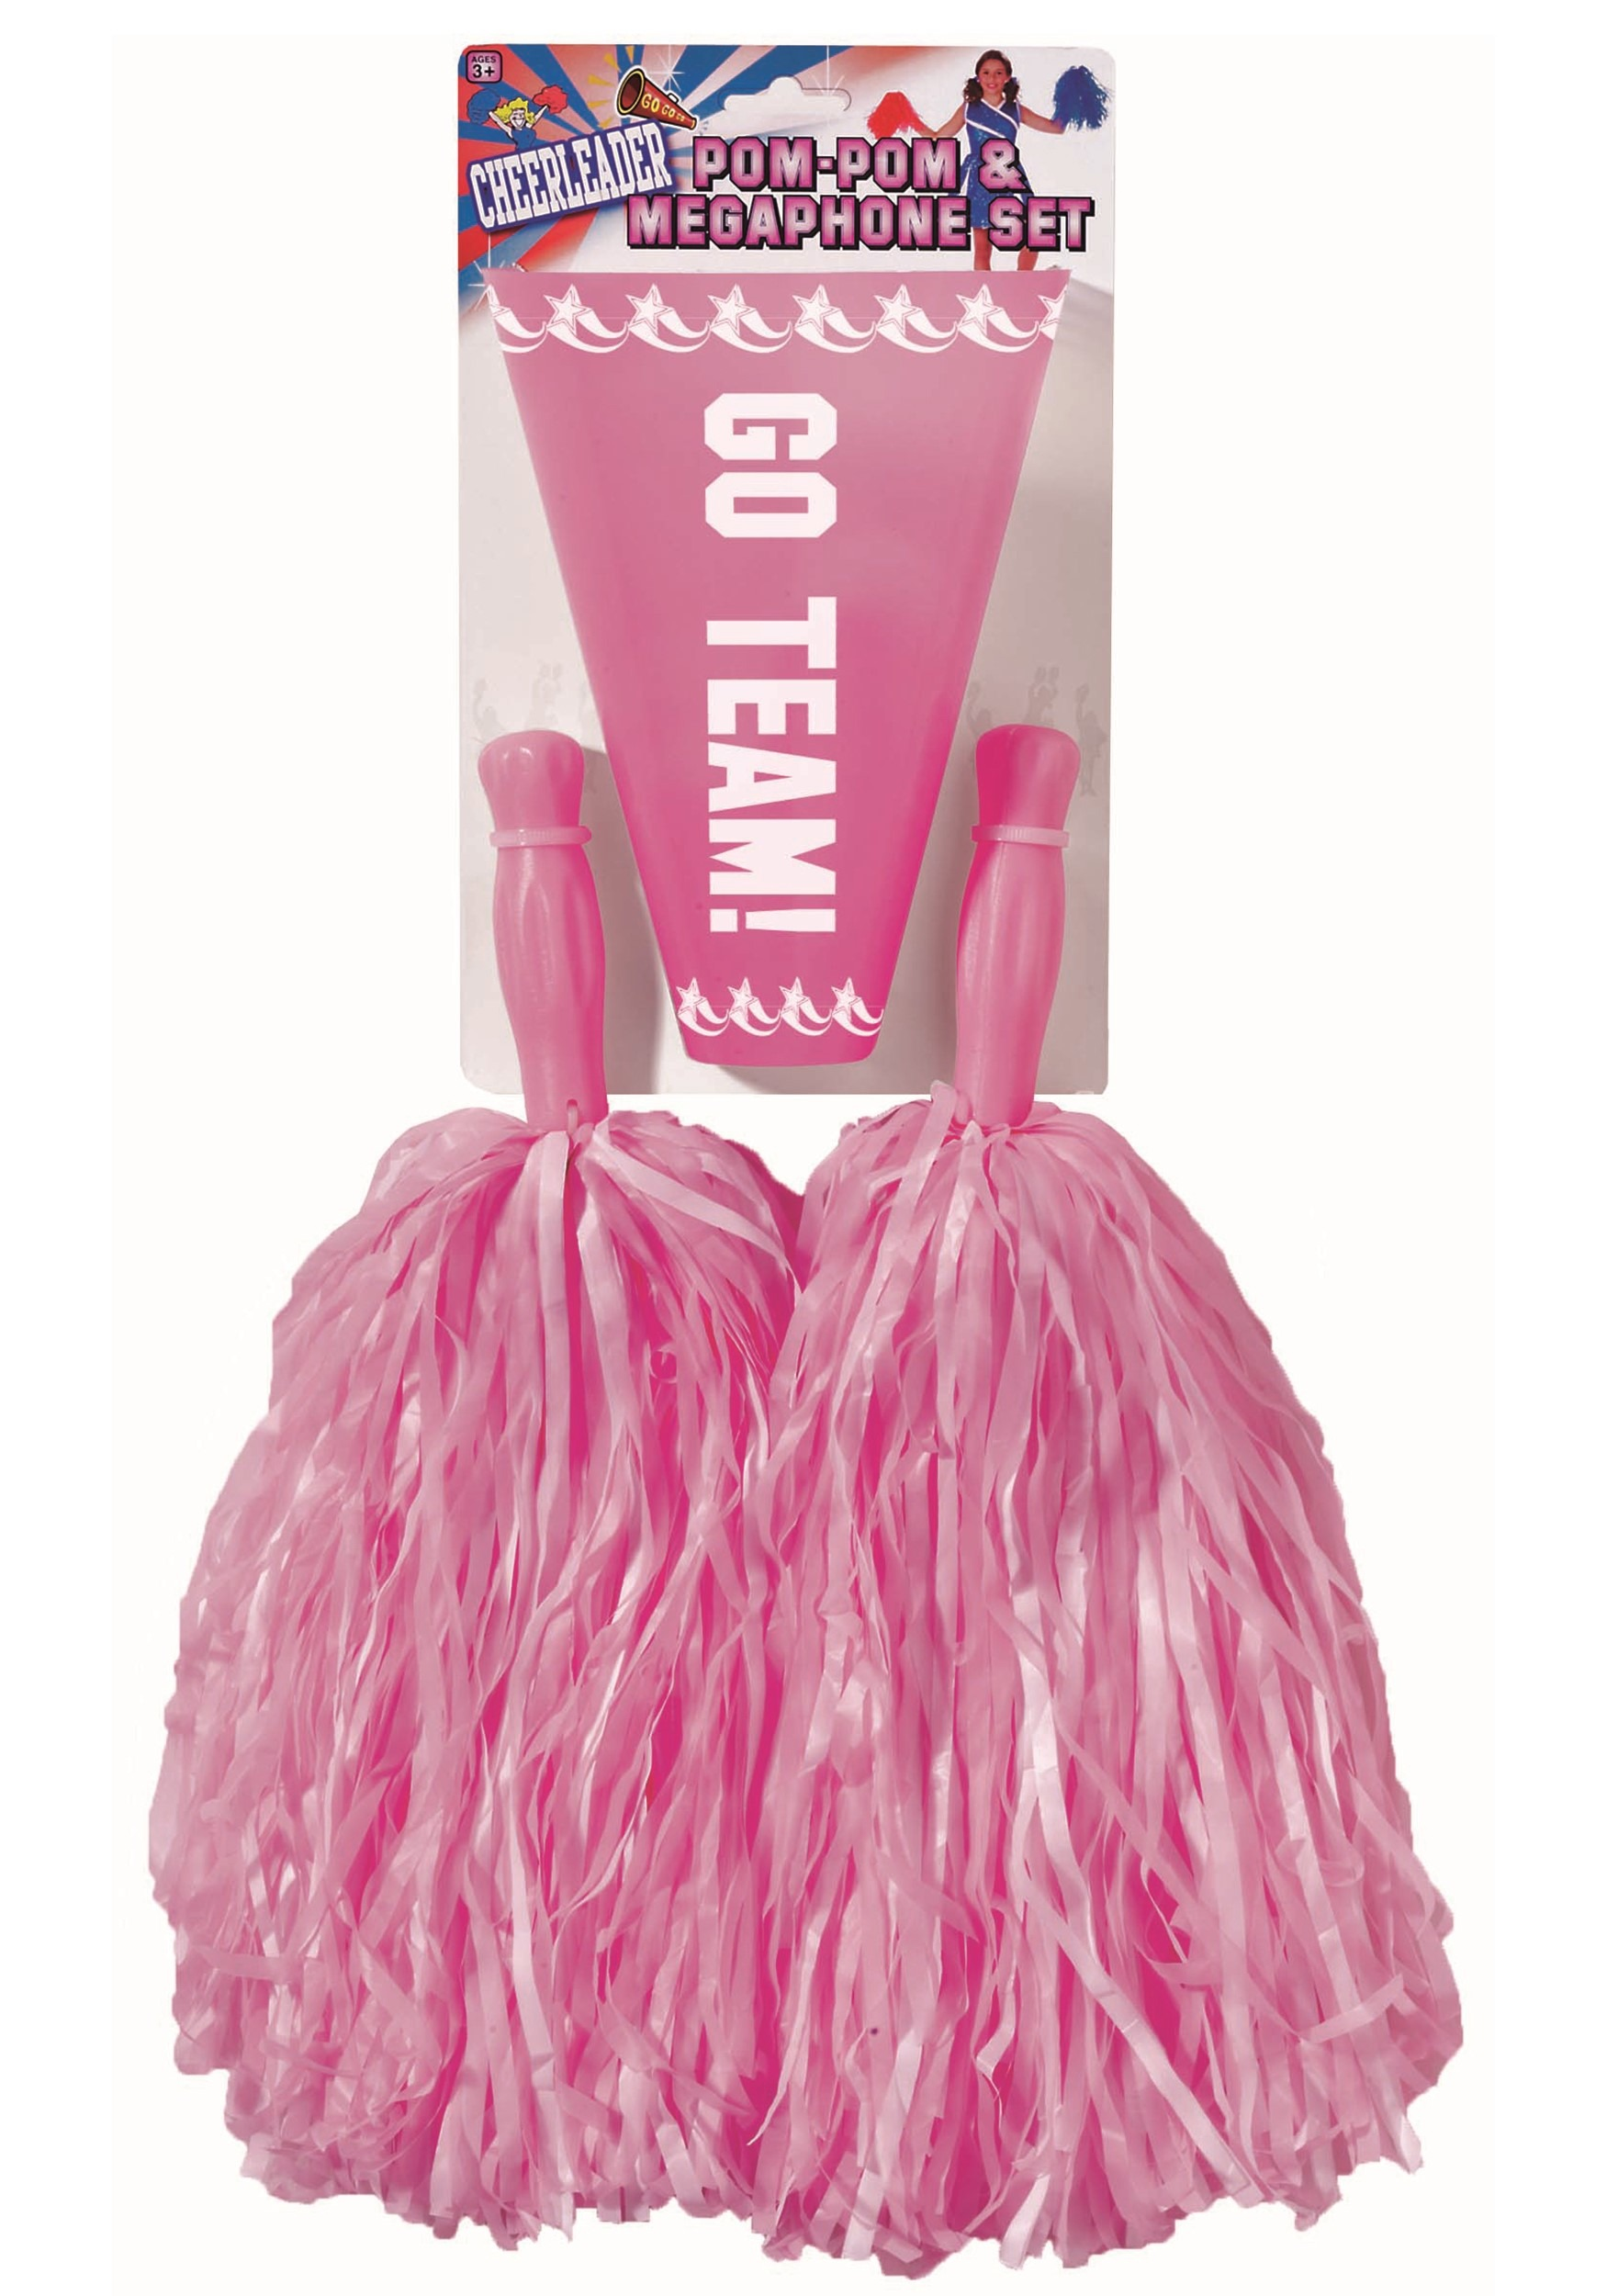 Pink Pom Pom and Megaphone Set